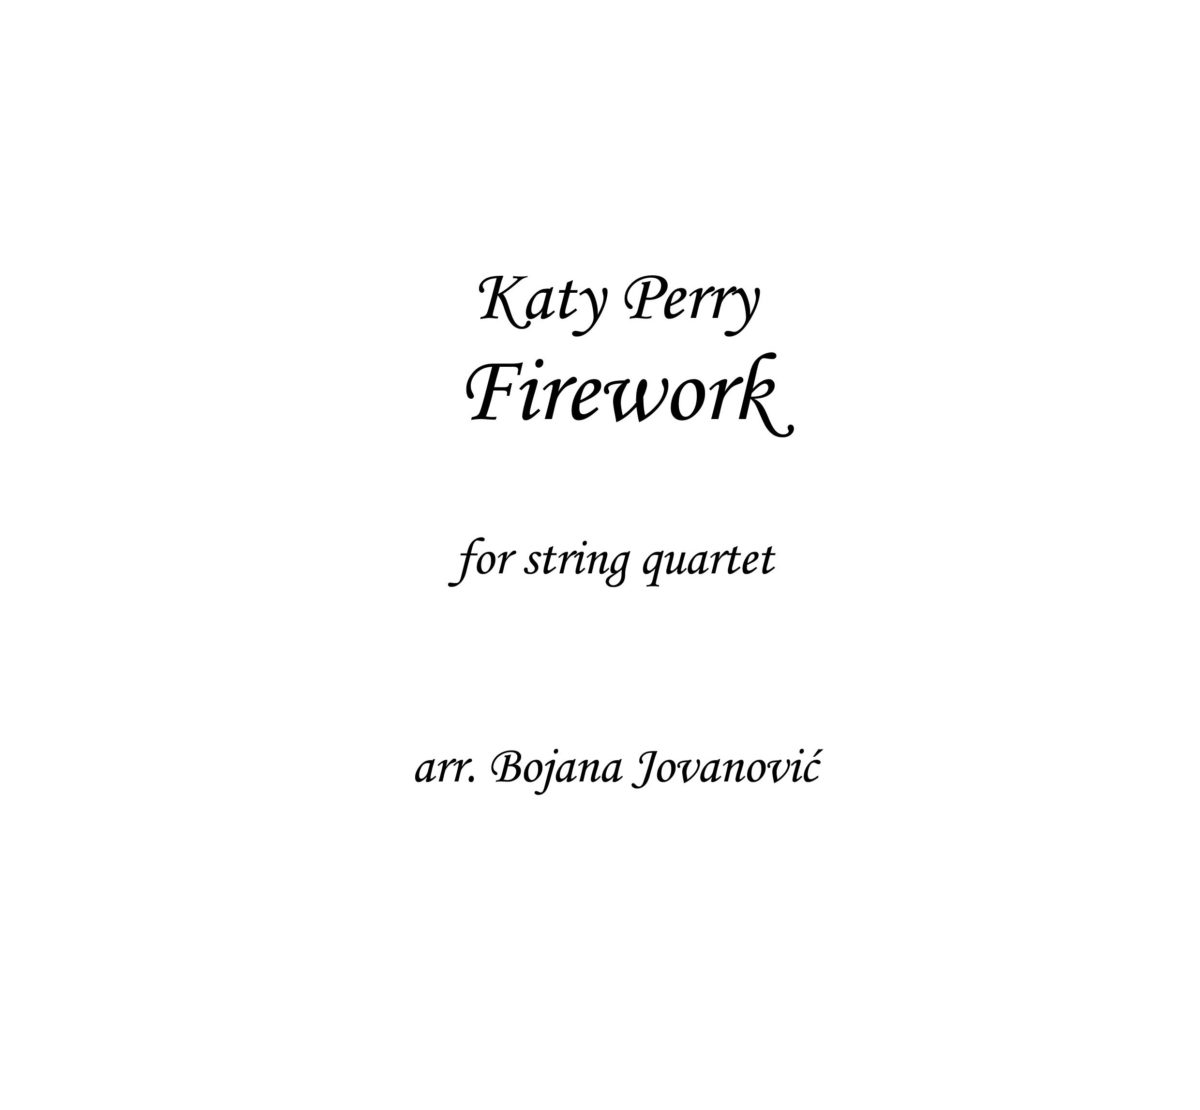 Firework (Katy Perry) - Sheet Music